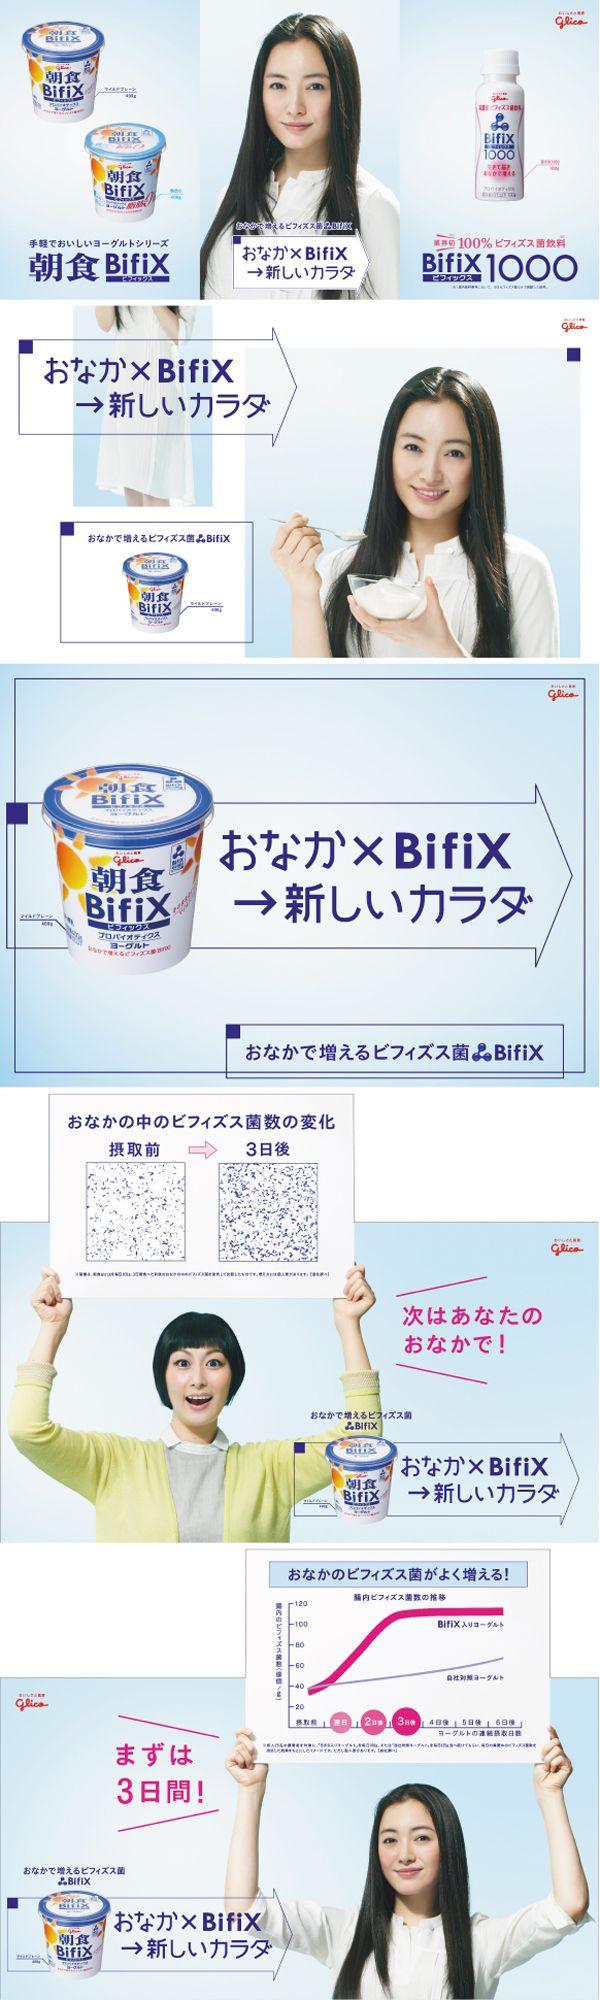 2013 Bifix